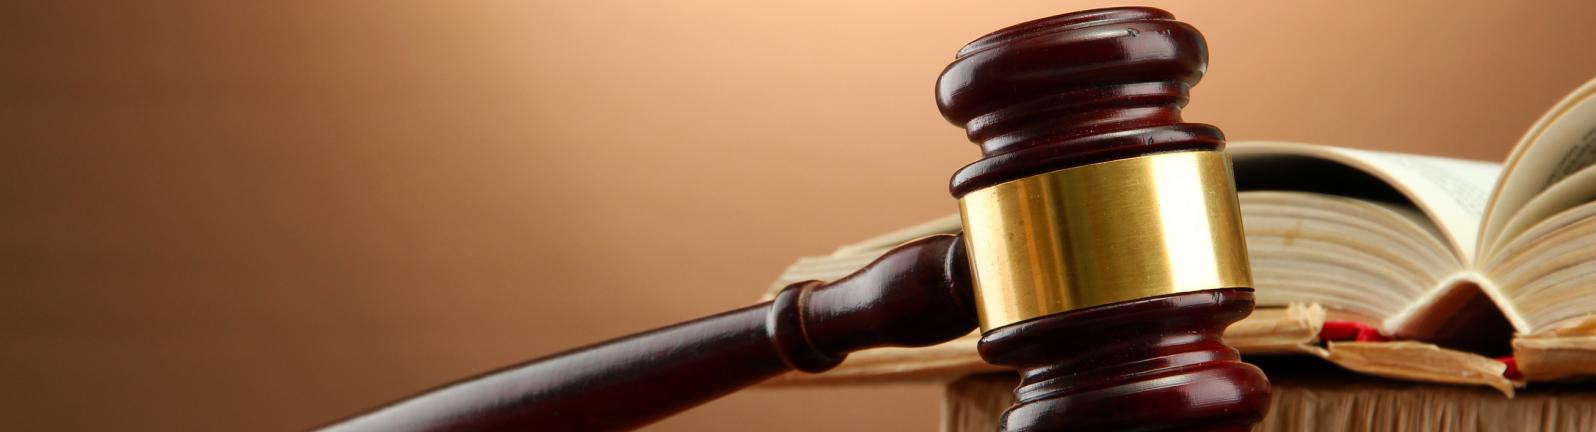 strafrecht advocaat groningen